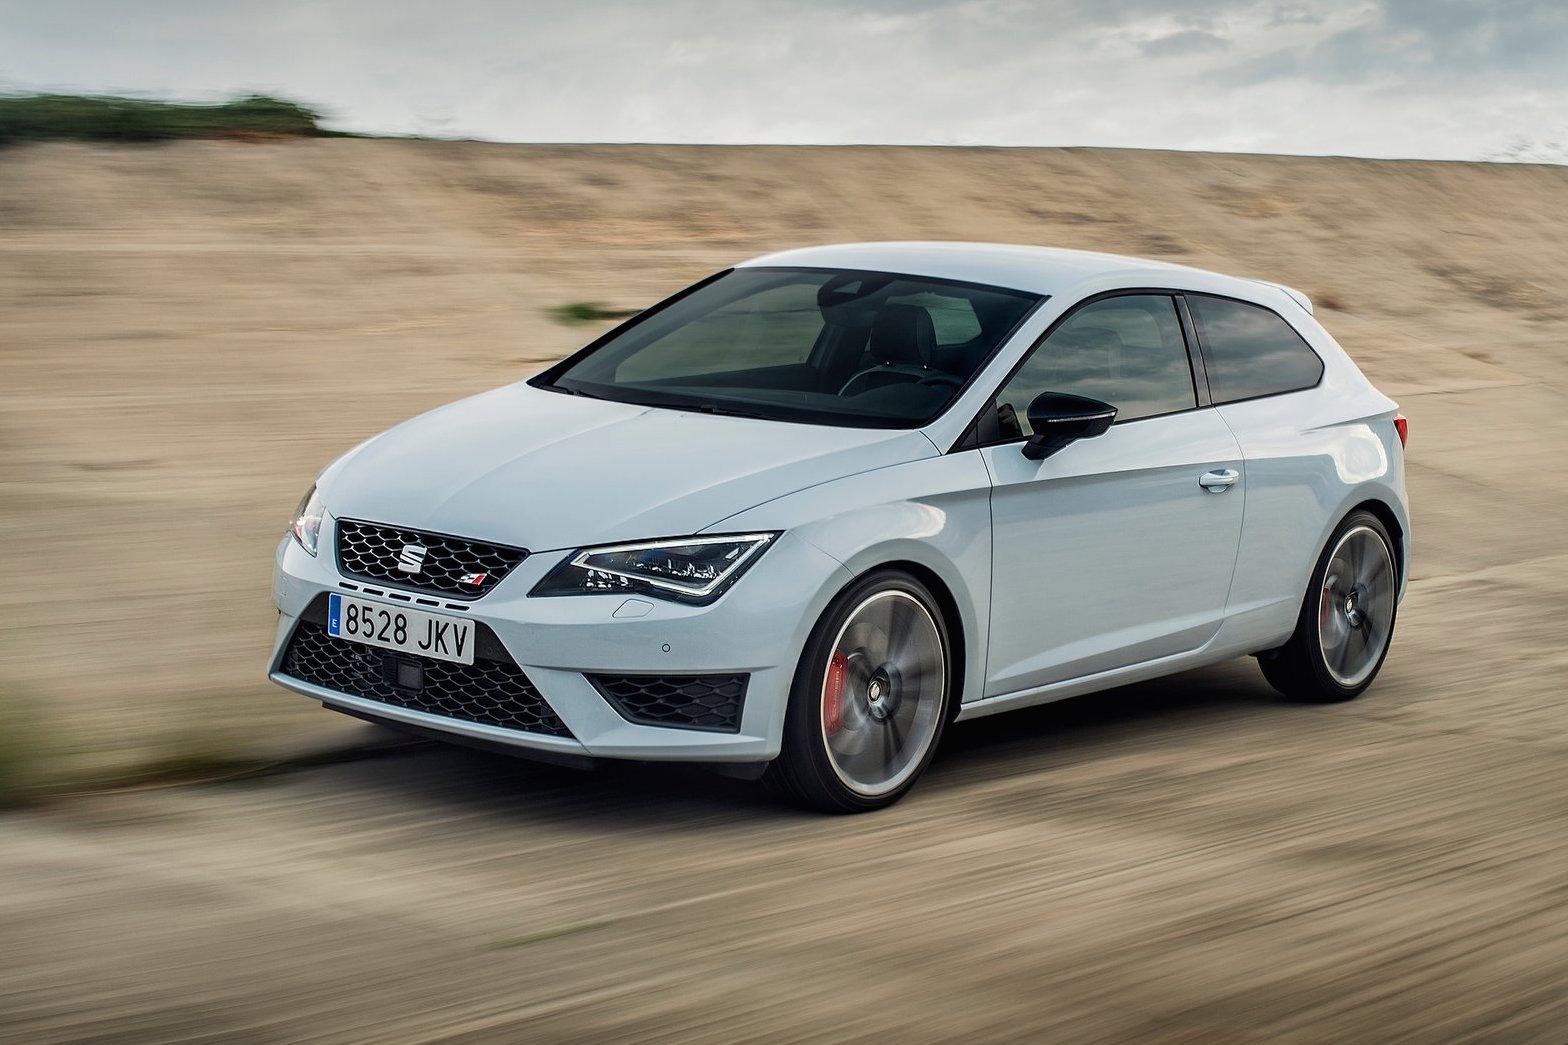 SEAT planning potent 220kW-plus AWD Leon Cupra